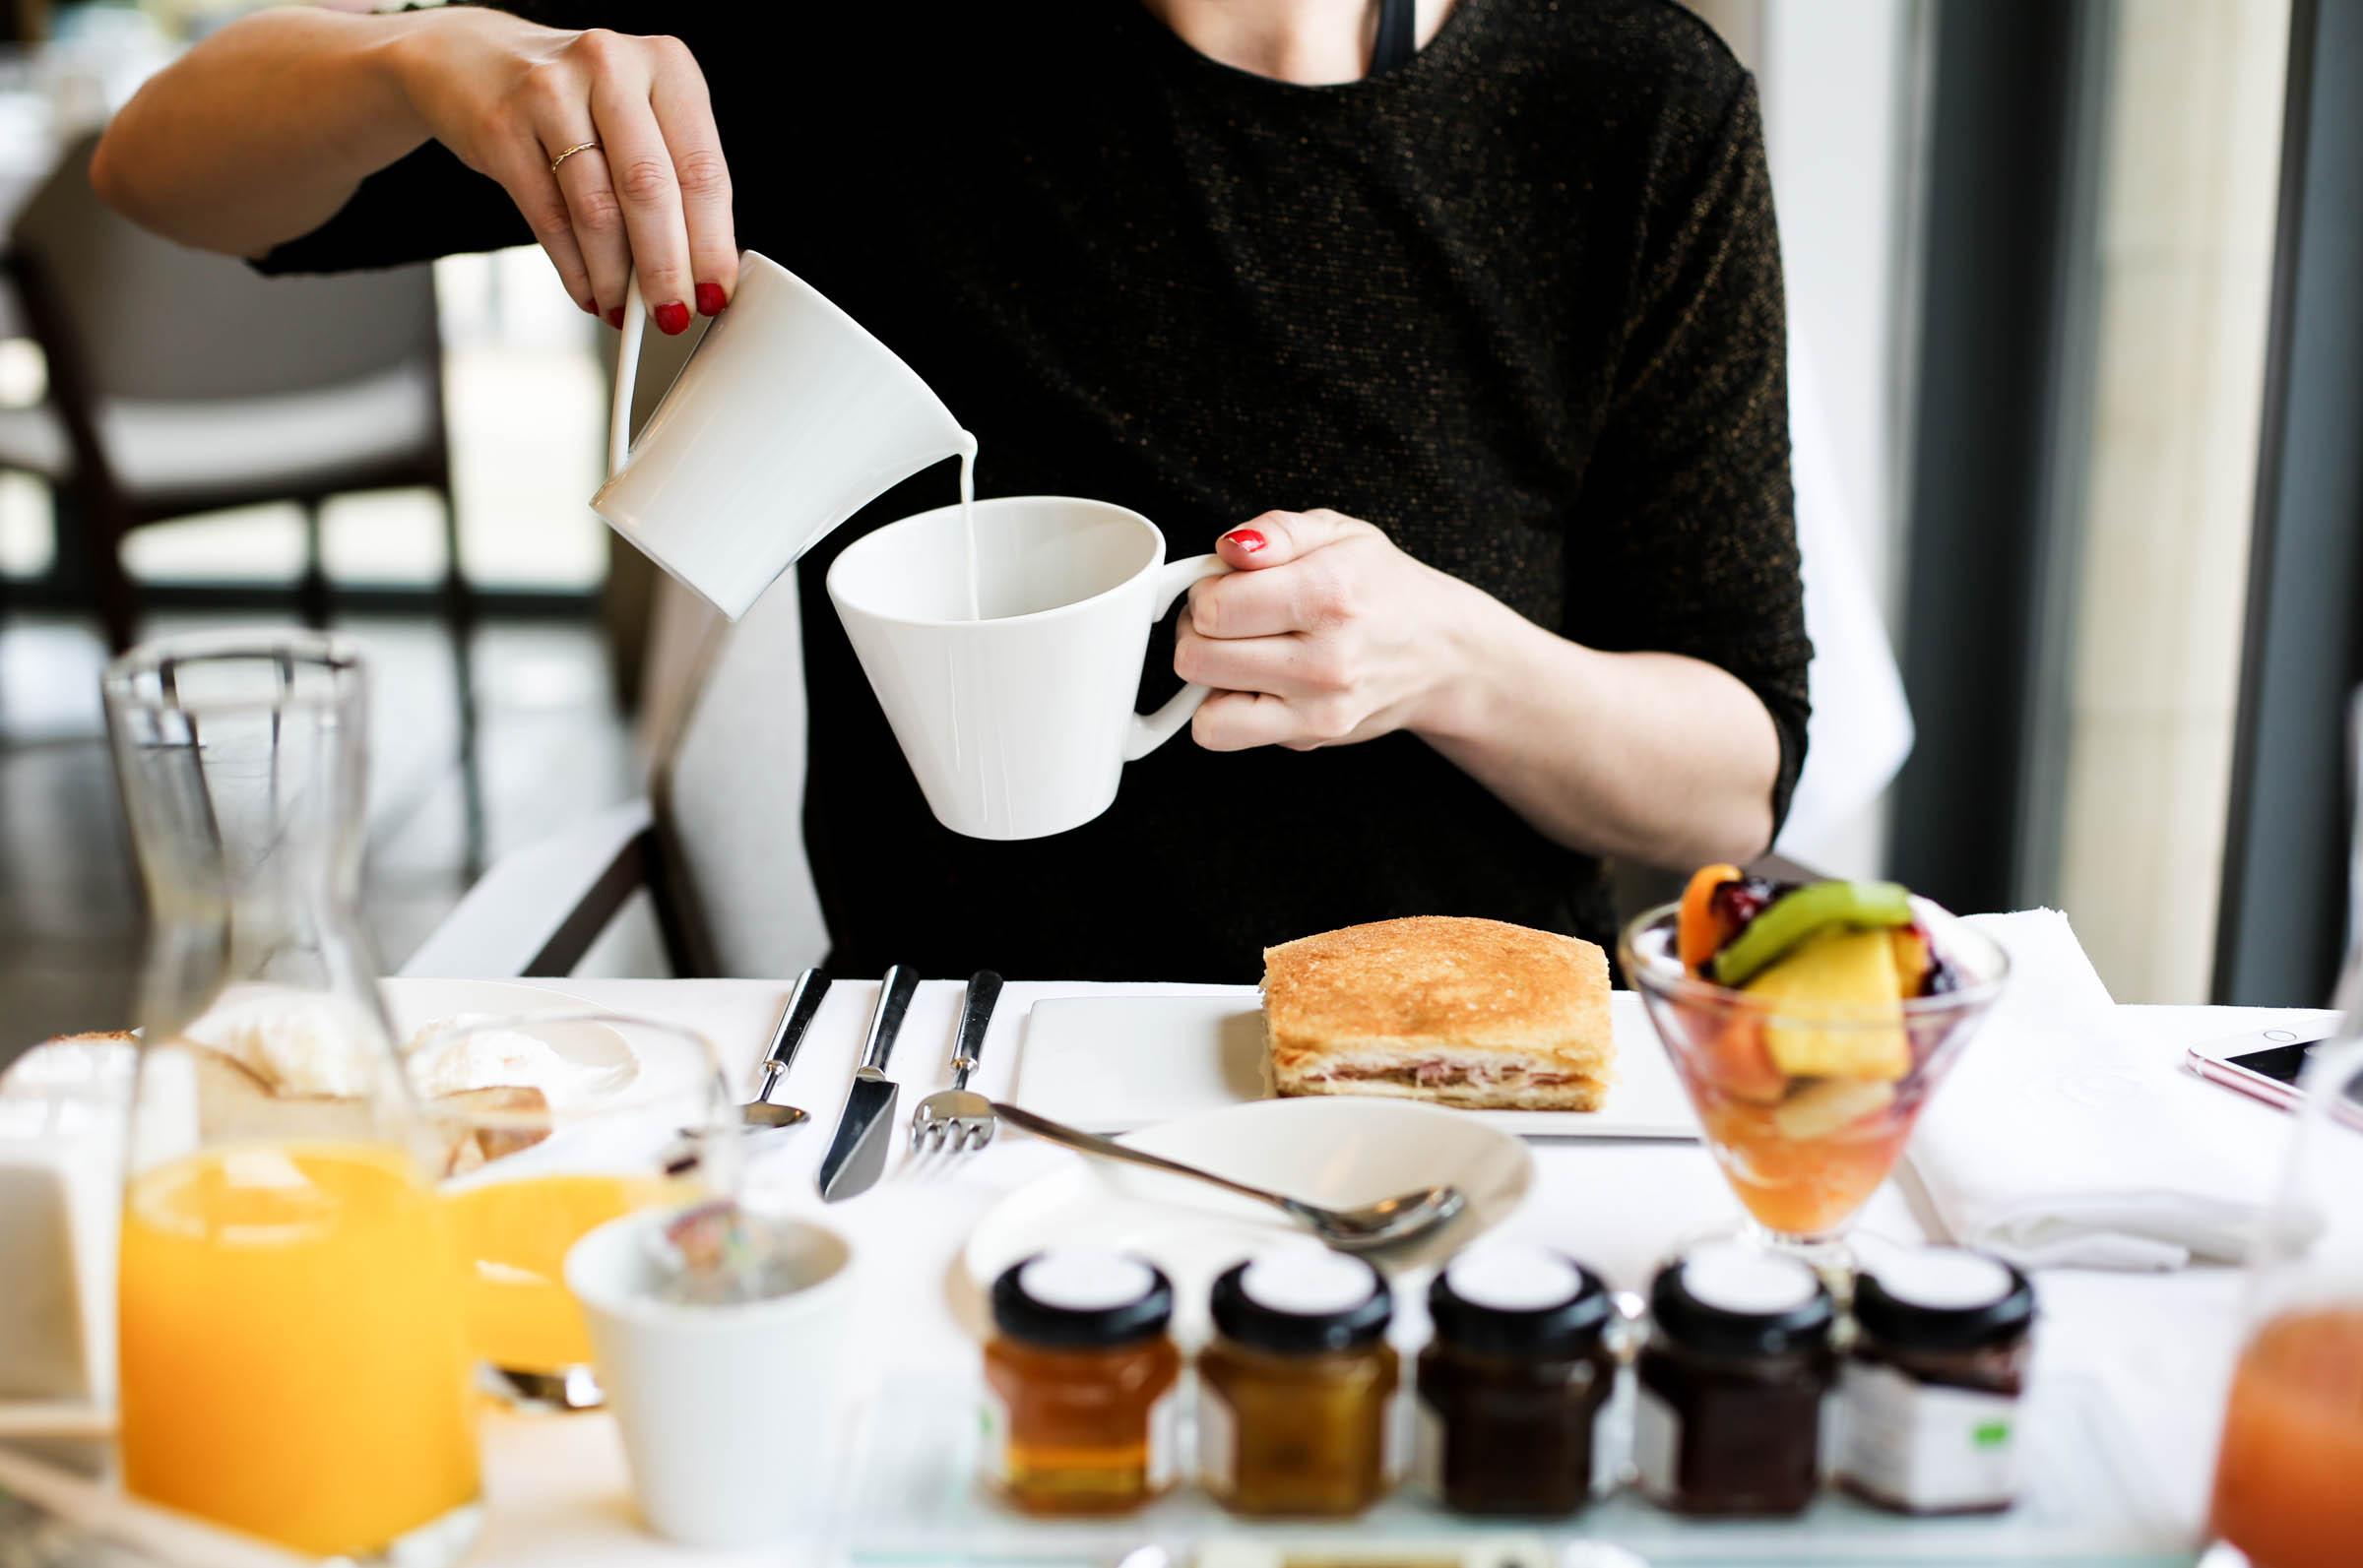 Breakfast at Domaine de Verchant. Croque Monsieur with truffle oil.